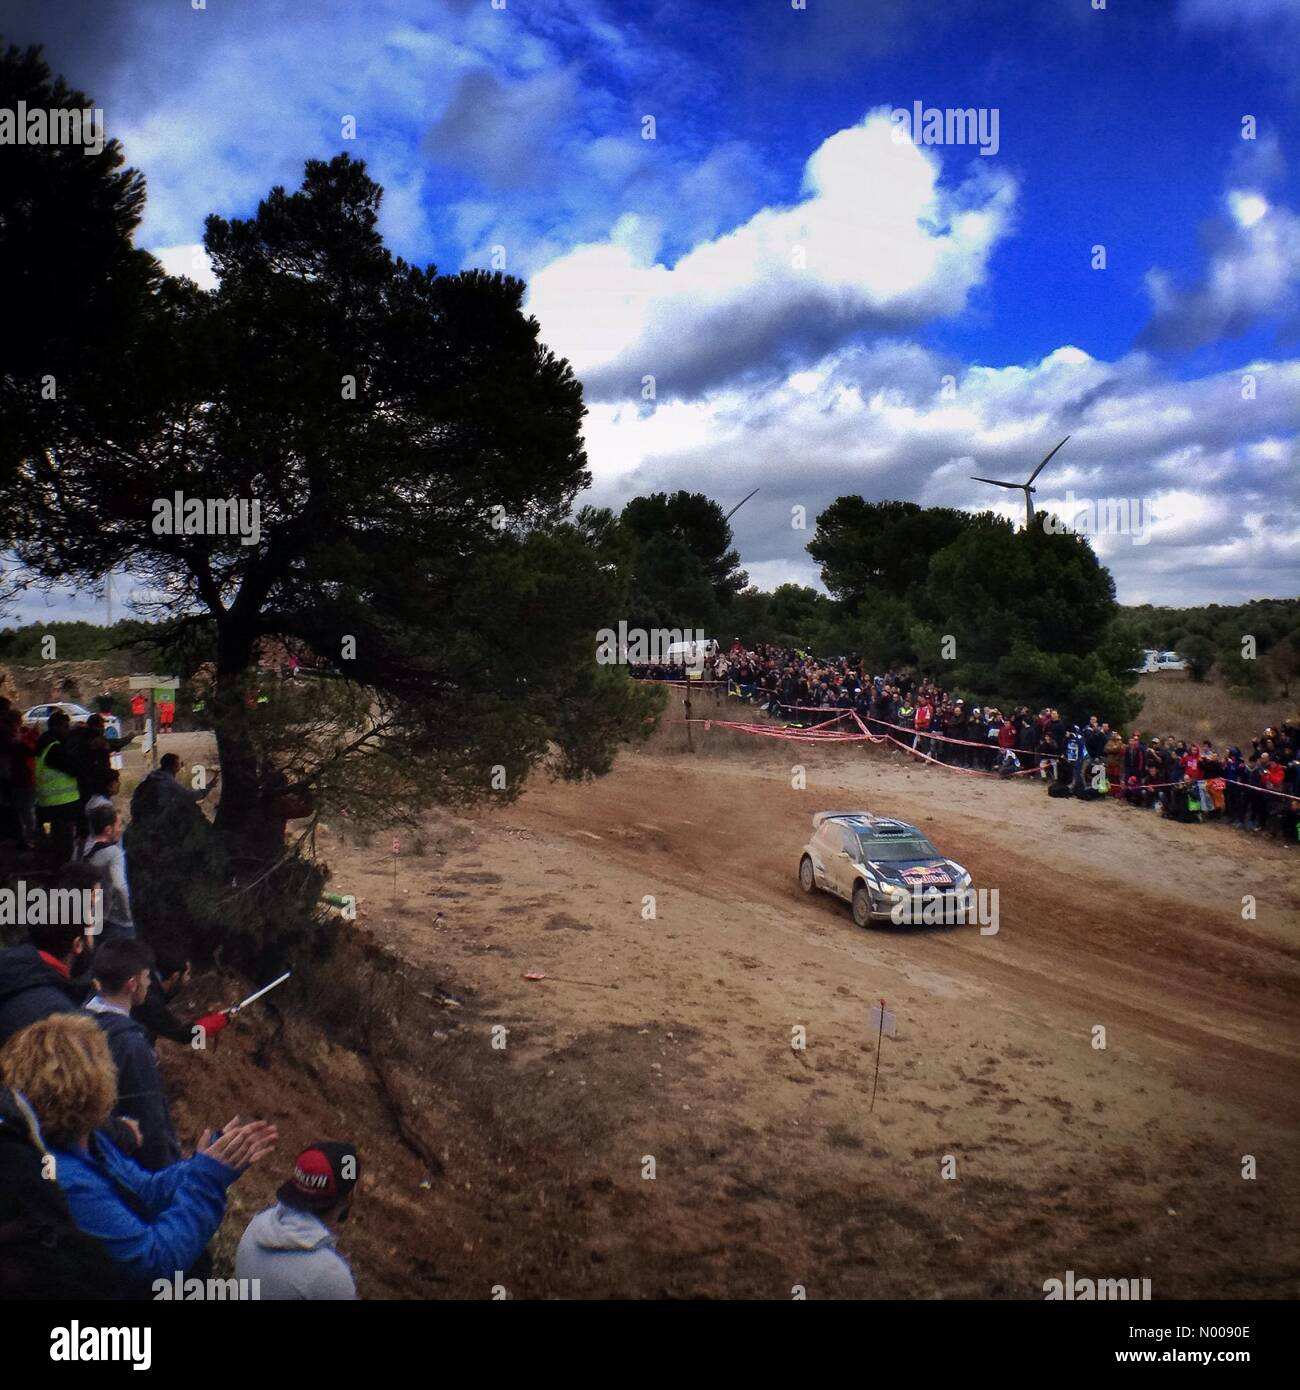 Hyundai New Castle De: Wrc Rally Car Stock Photos & Wrc Rally Car Stock Images